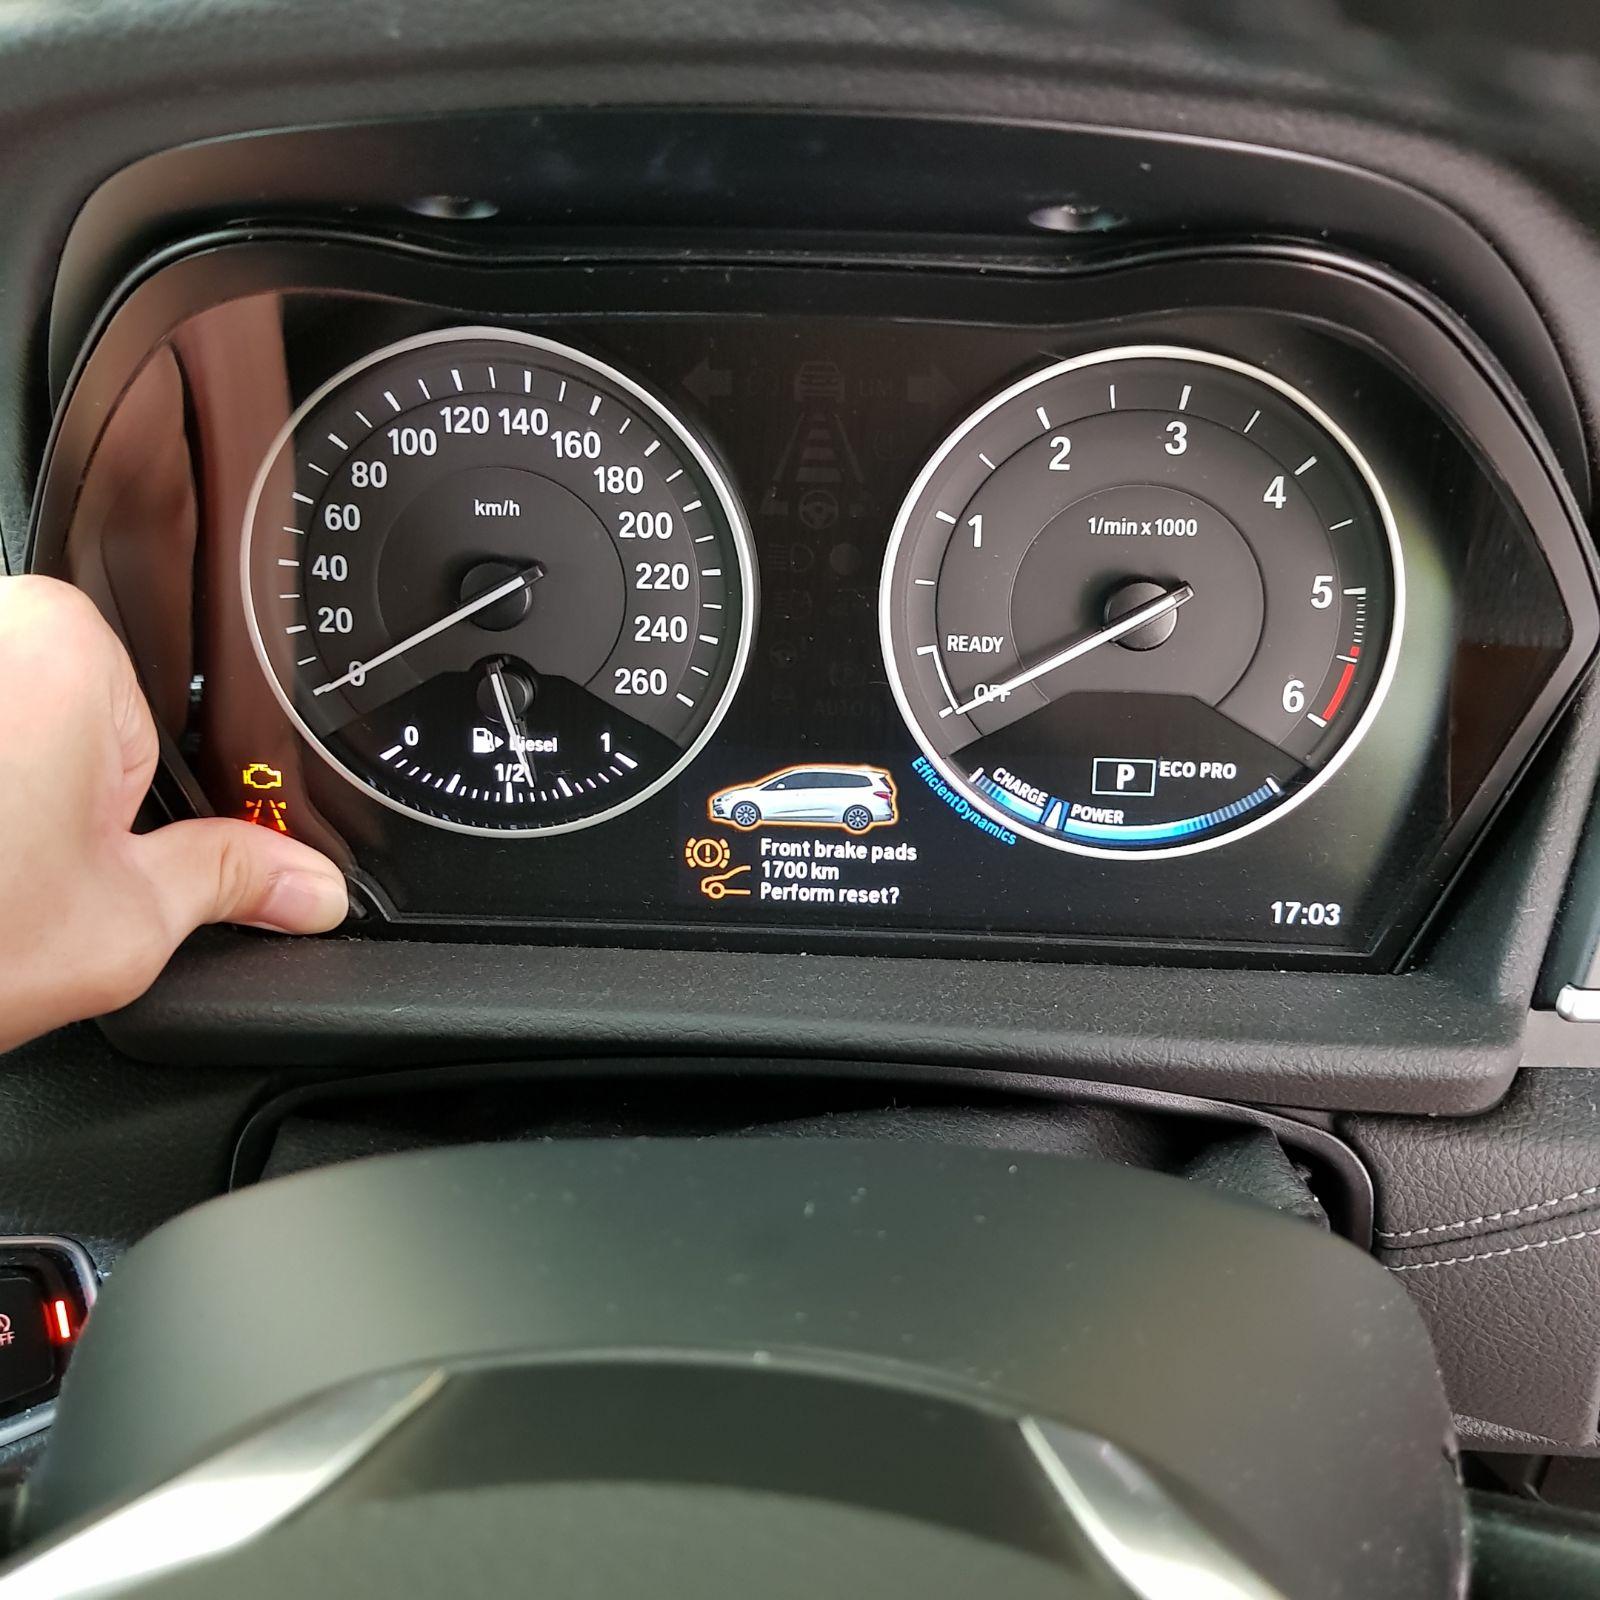 BMW Coding for F45, F46, F48 (Active Tourer / Gran Tourer / X1): How